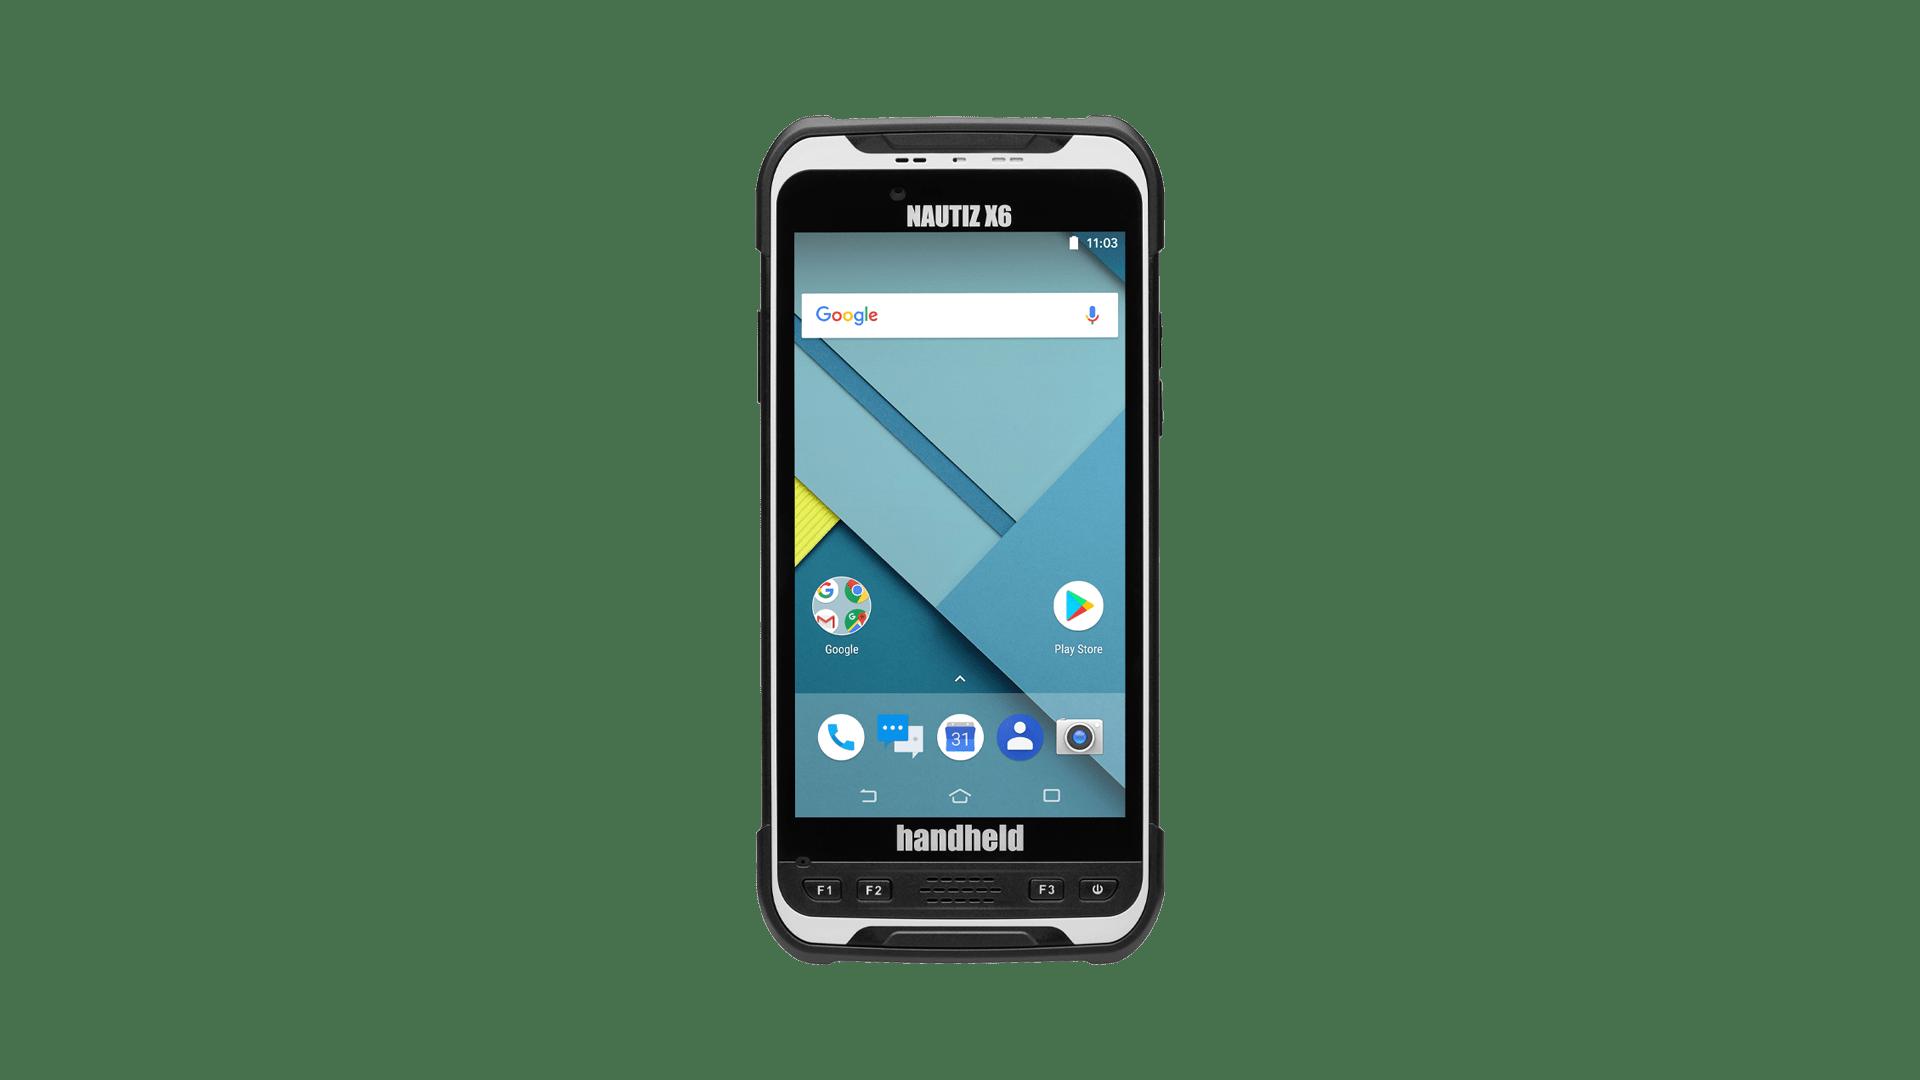 handheld nautiz x6 front